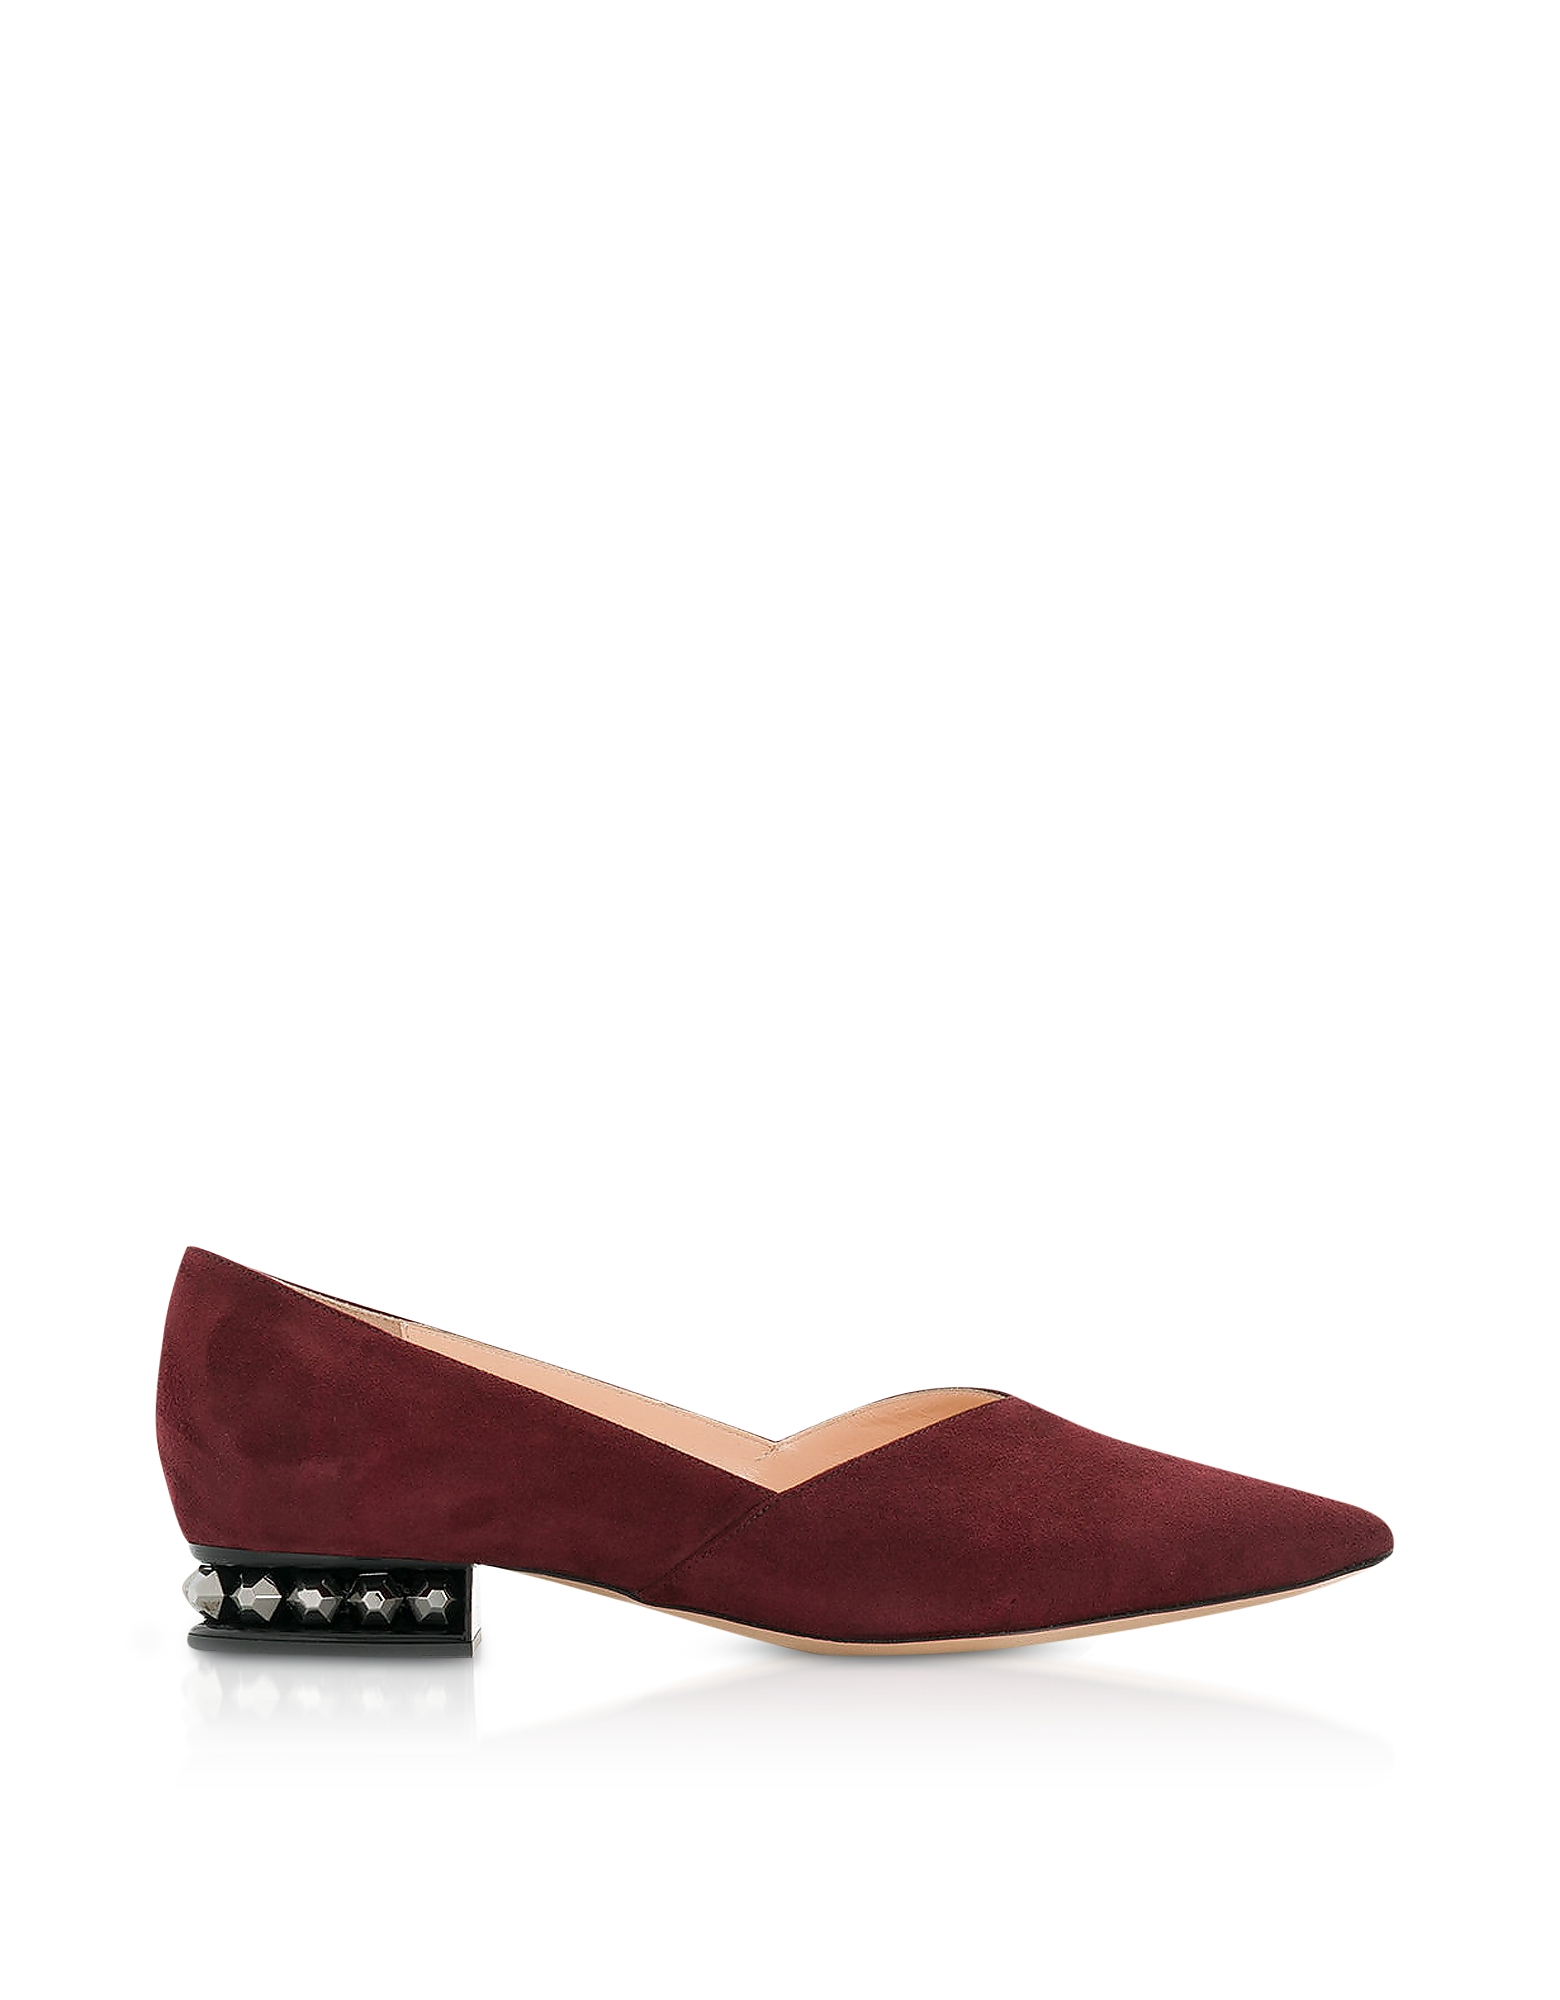 Image of Nicholas Kirkwood Designer Shoes, Aubergine Suede 25mm Suzi Ballerinas